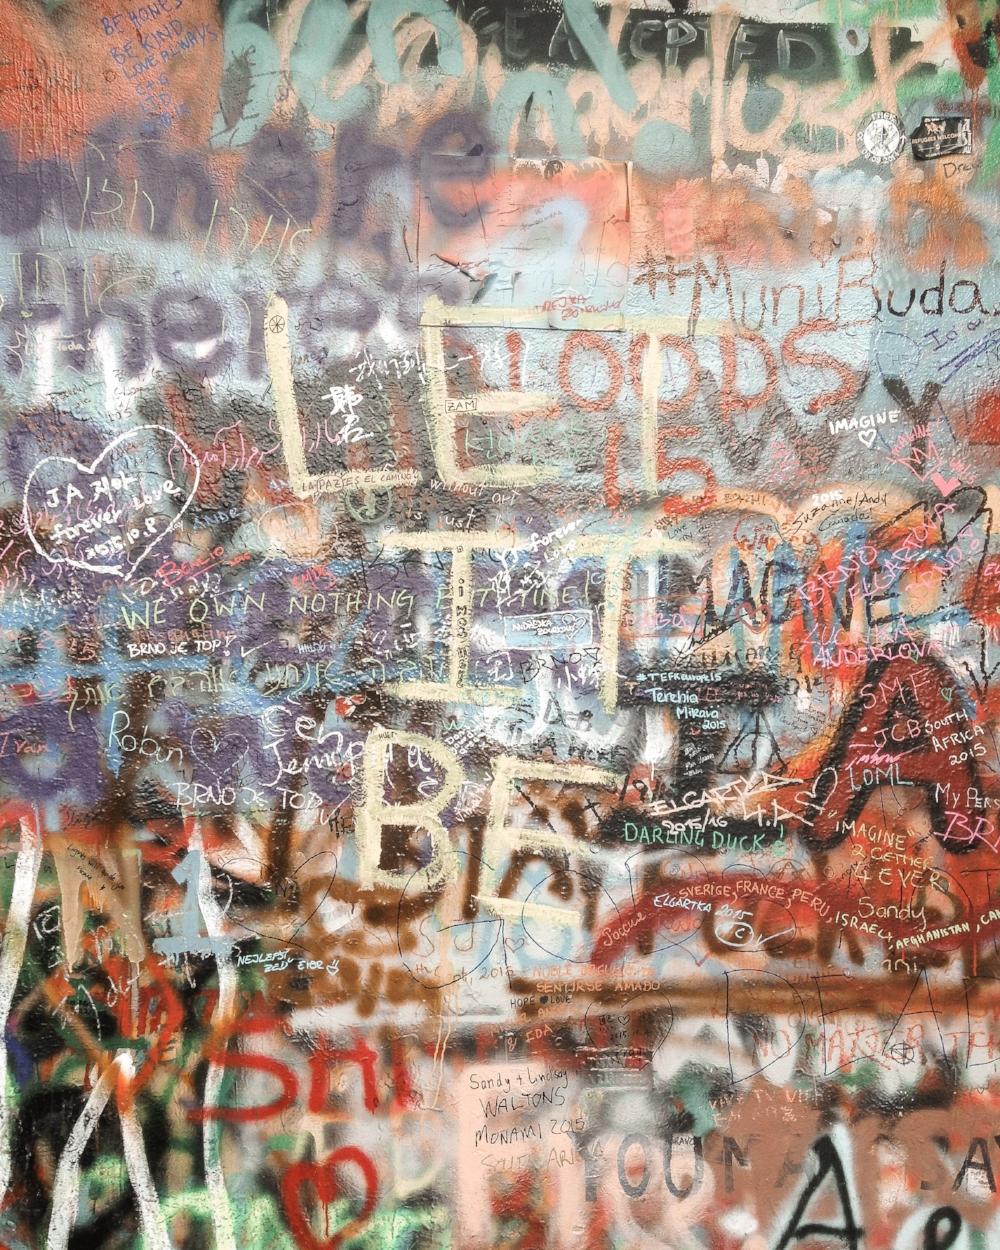 beatles_wall_prague_tips_for_new_travelers